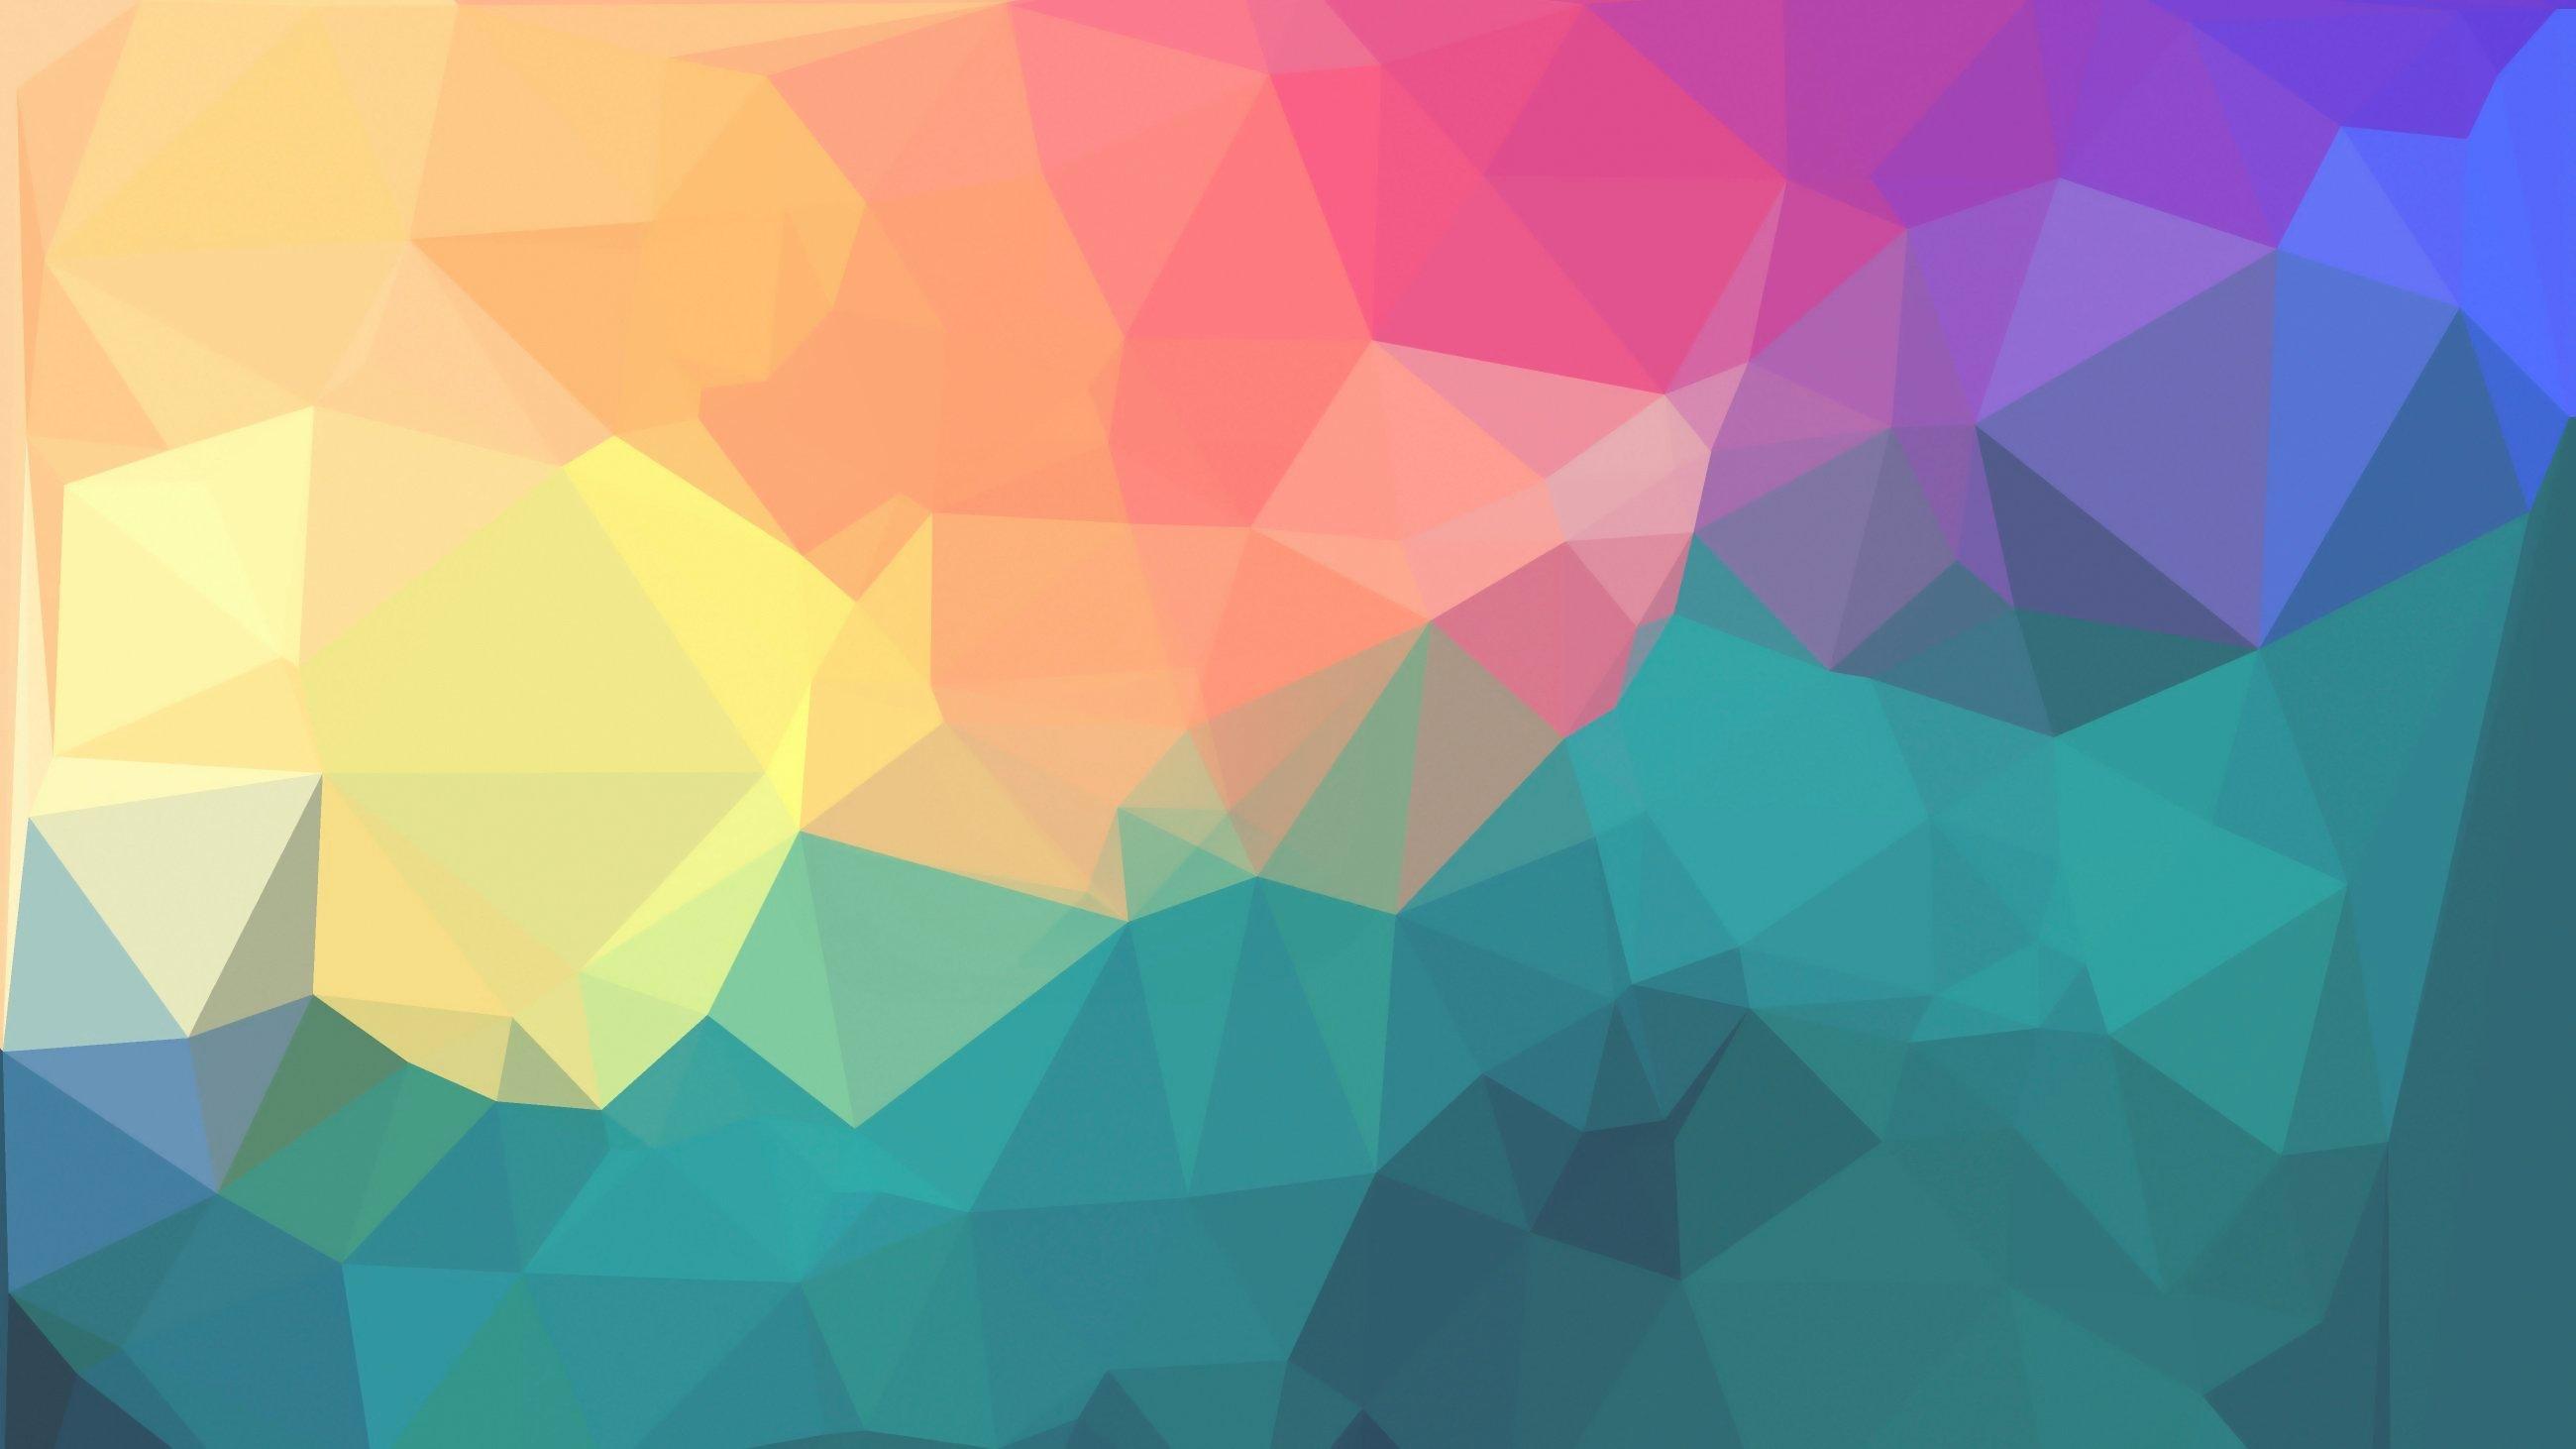 Fondos de pantalla Polígonos de colores